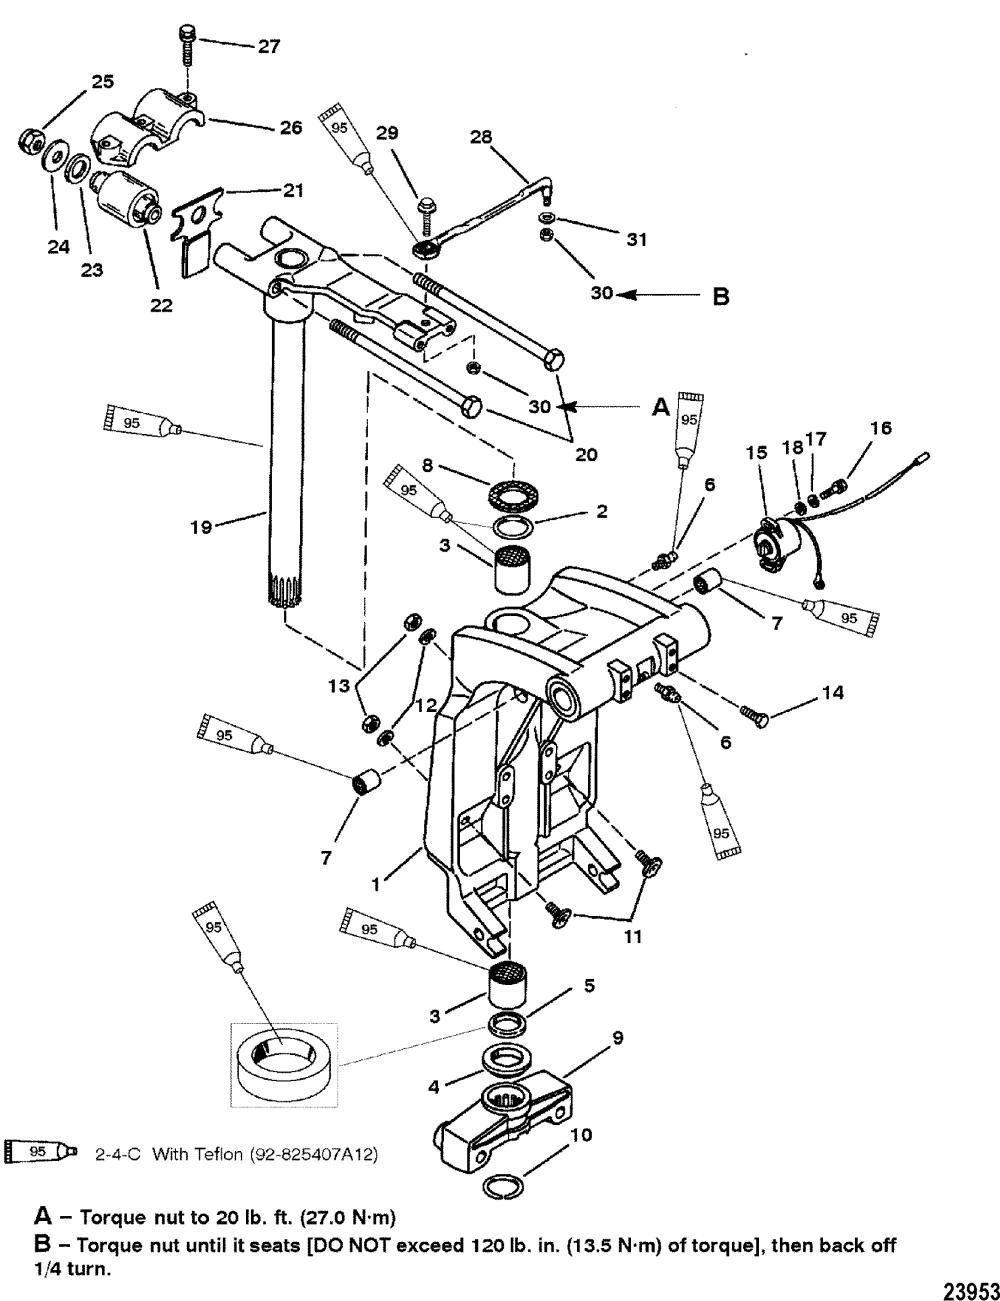 medium resolution of swivel bracket and steering arm for mariner mercury 225 250 efi 3 0l